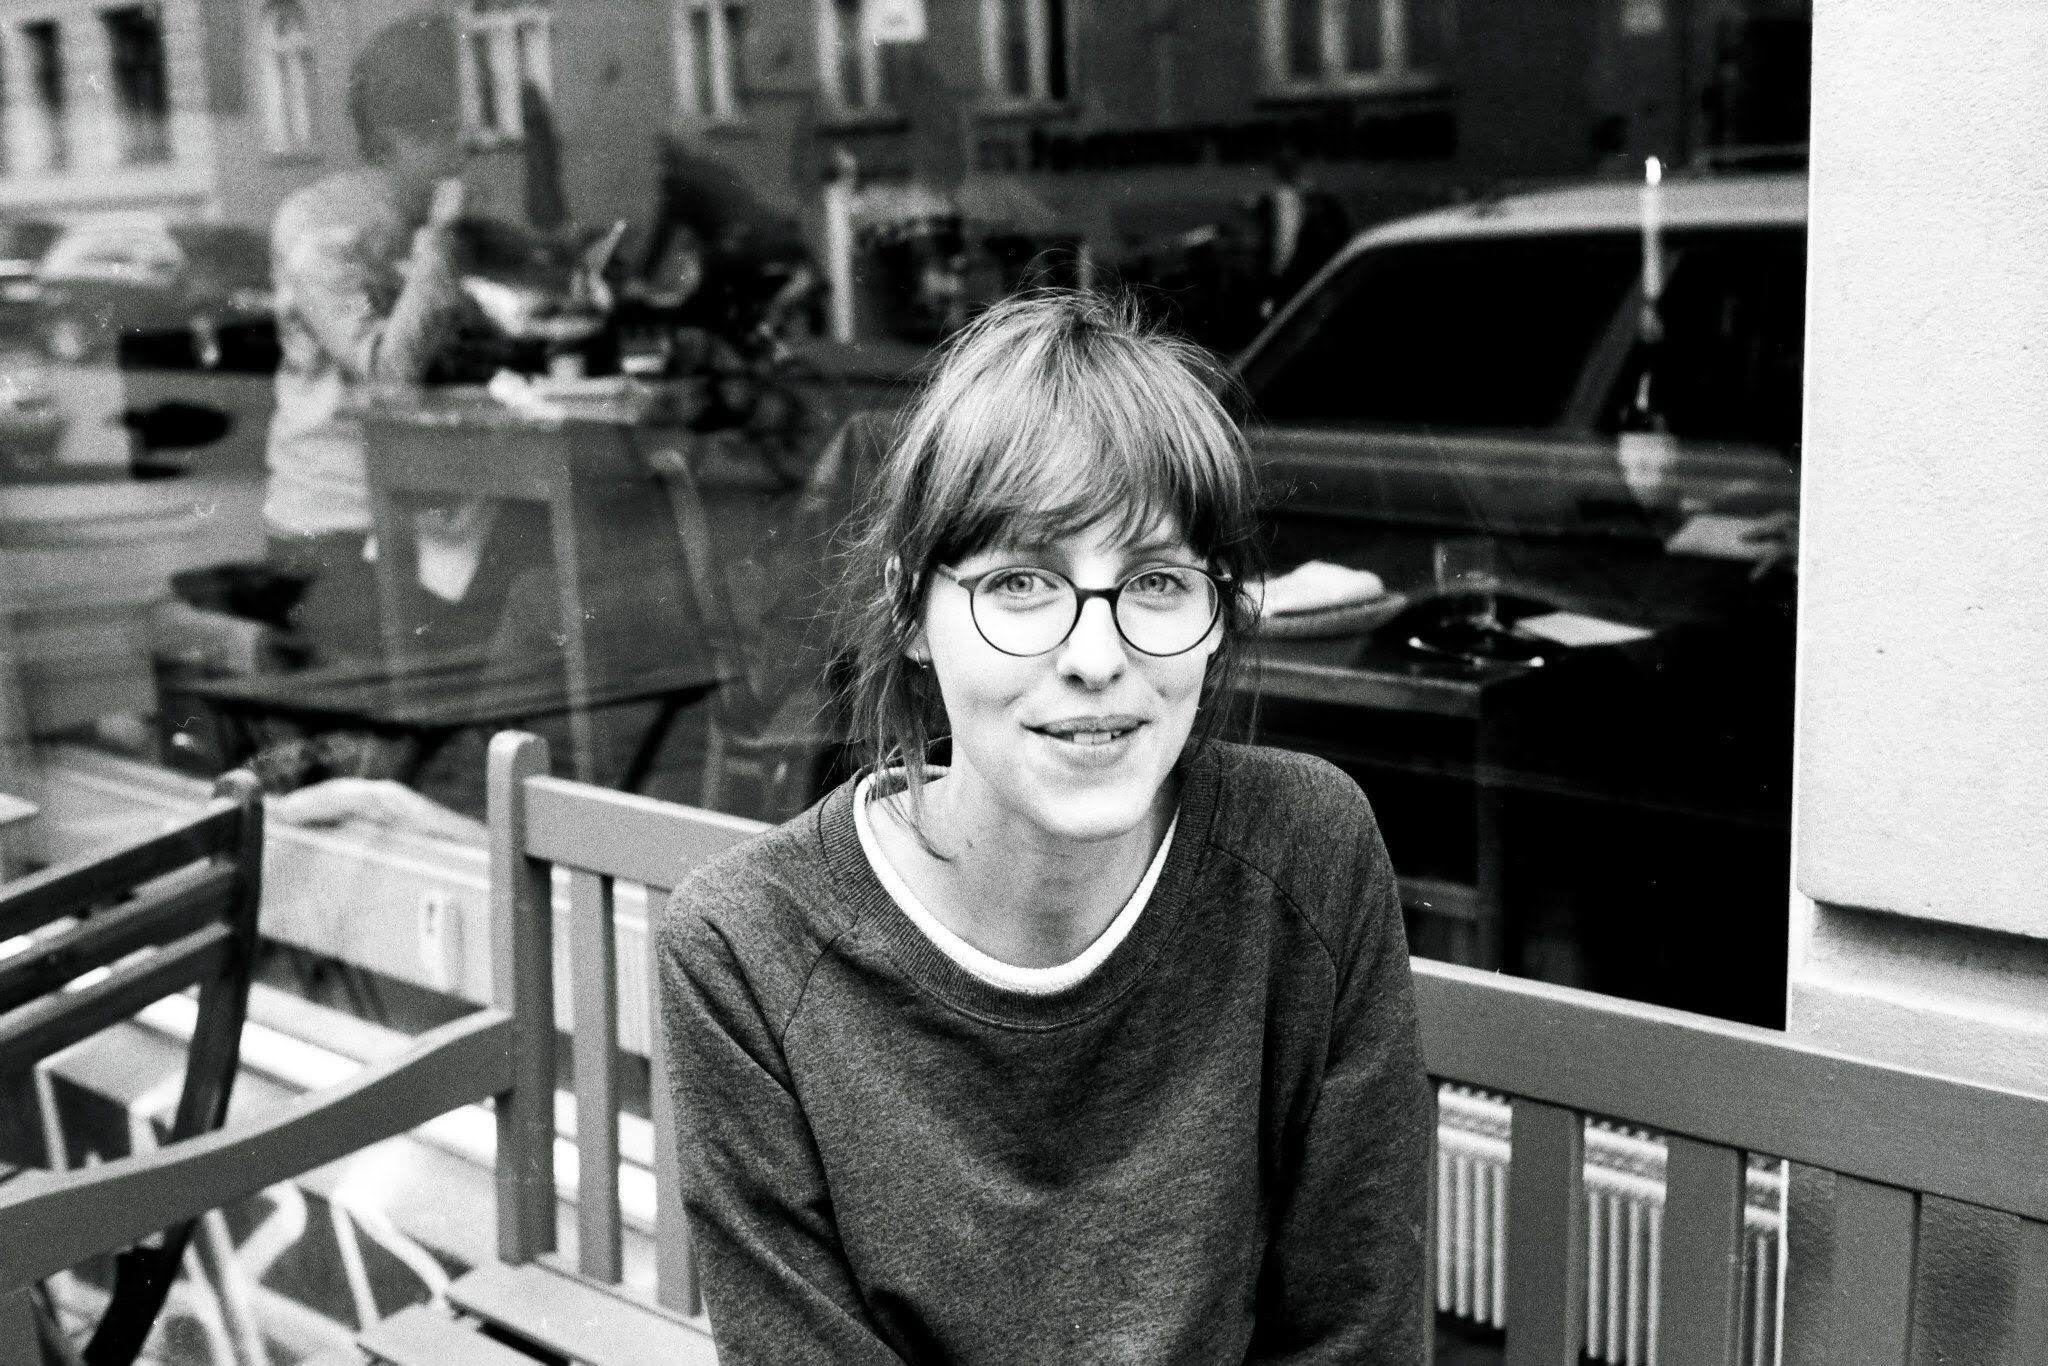 Johanne Schwensen, founder of It's Complicated